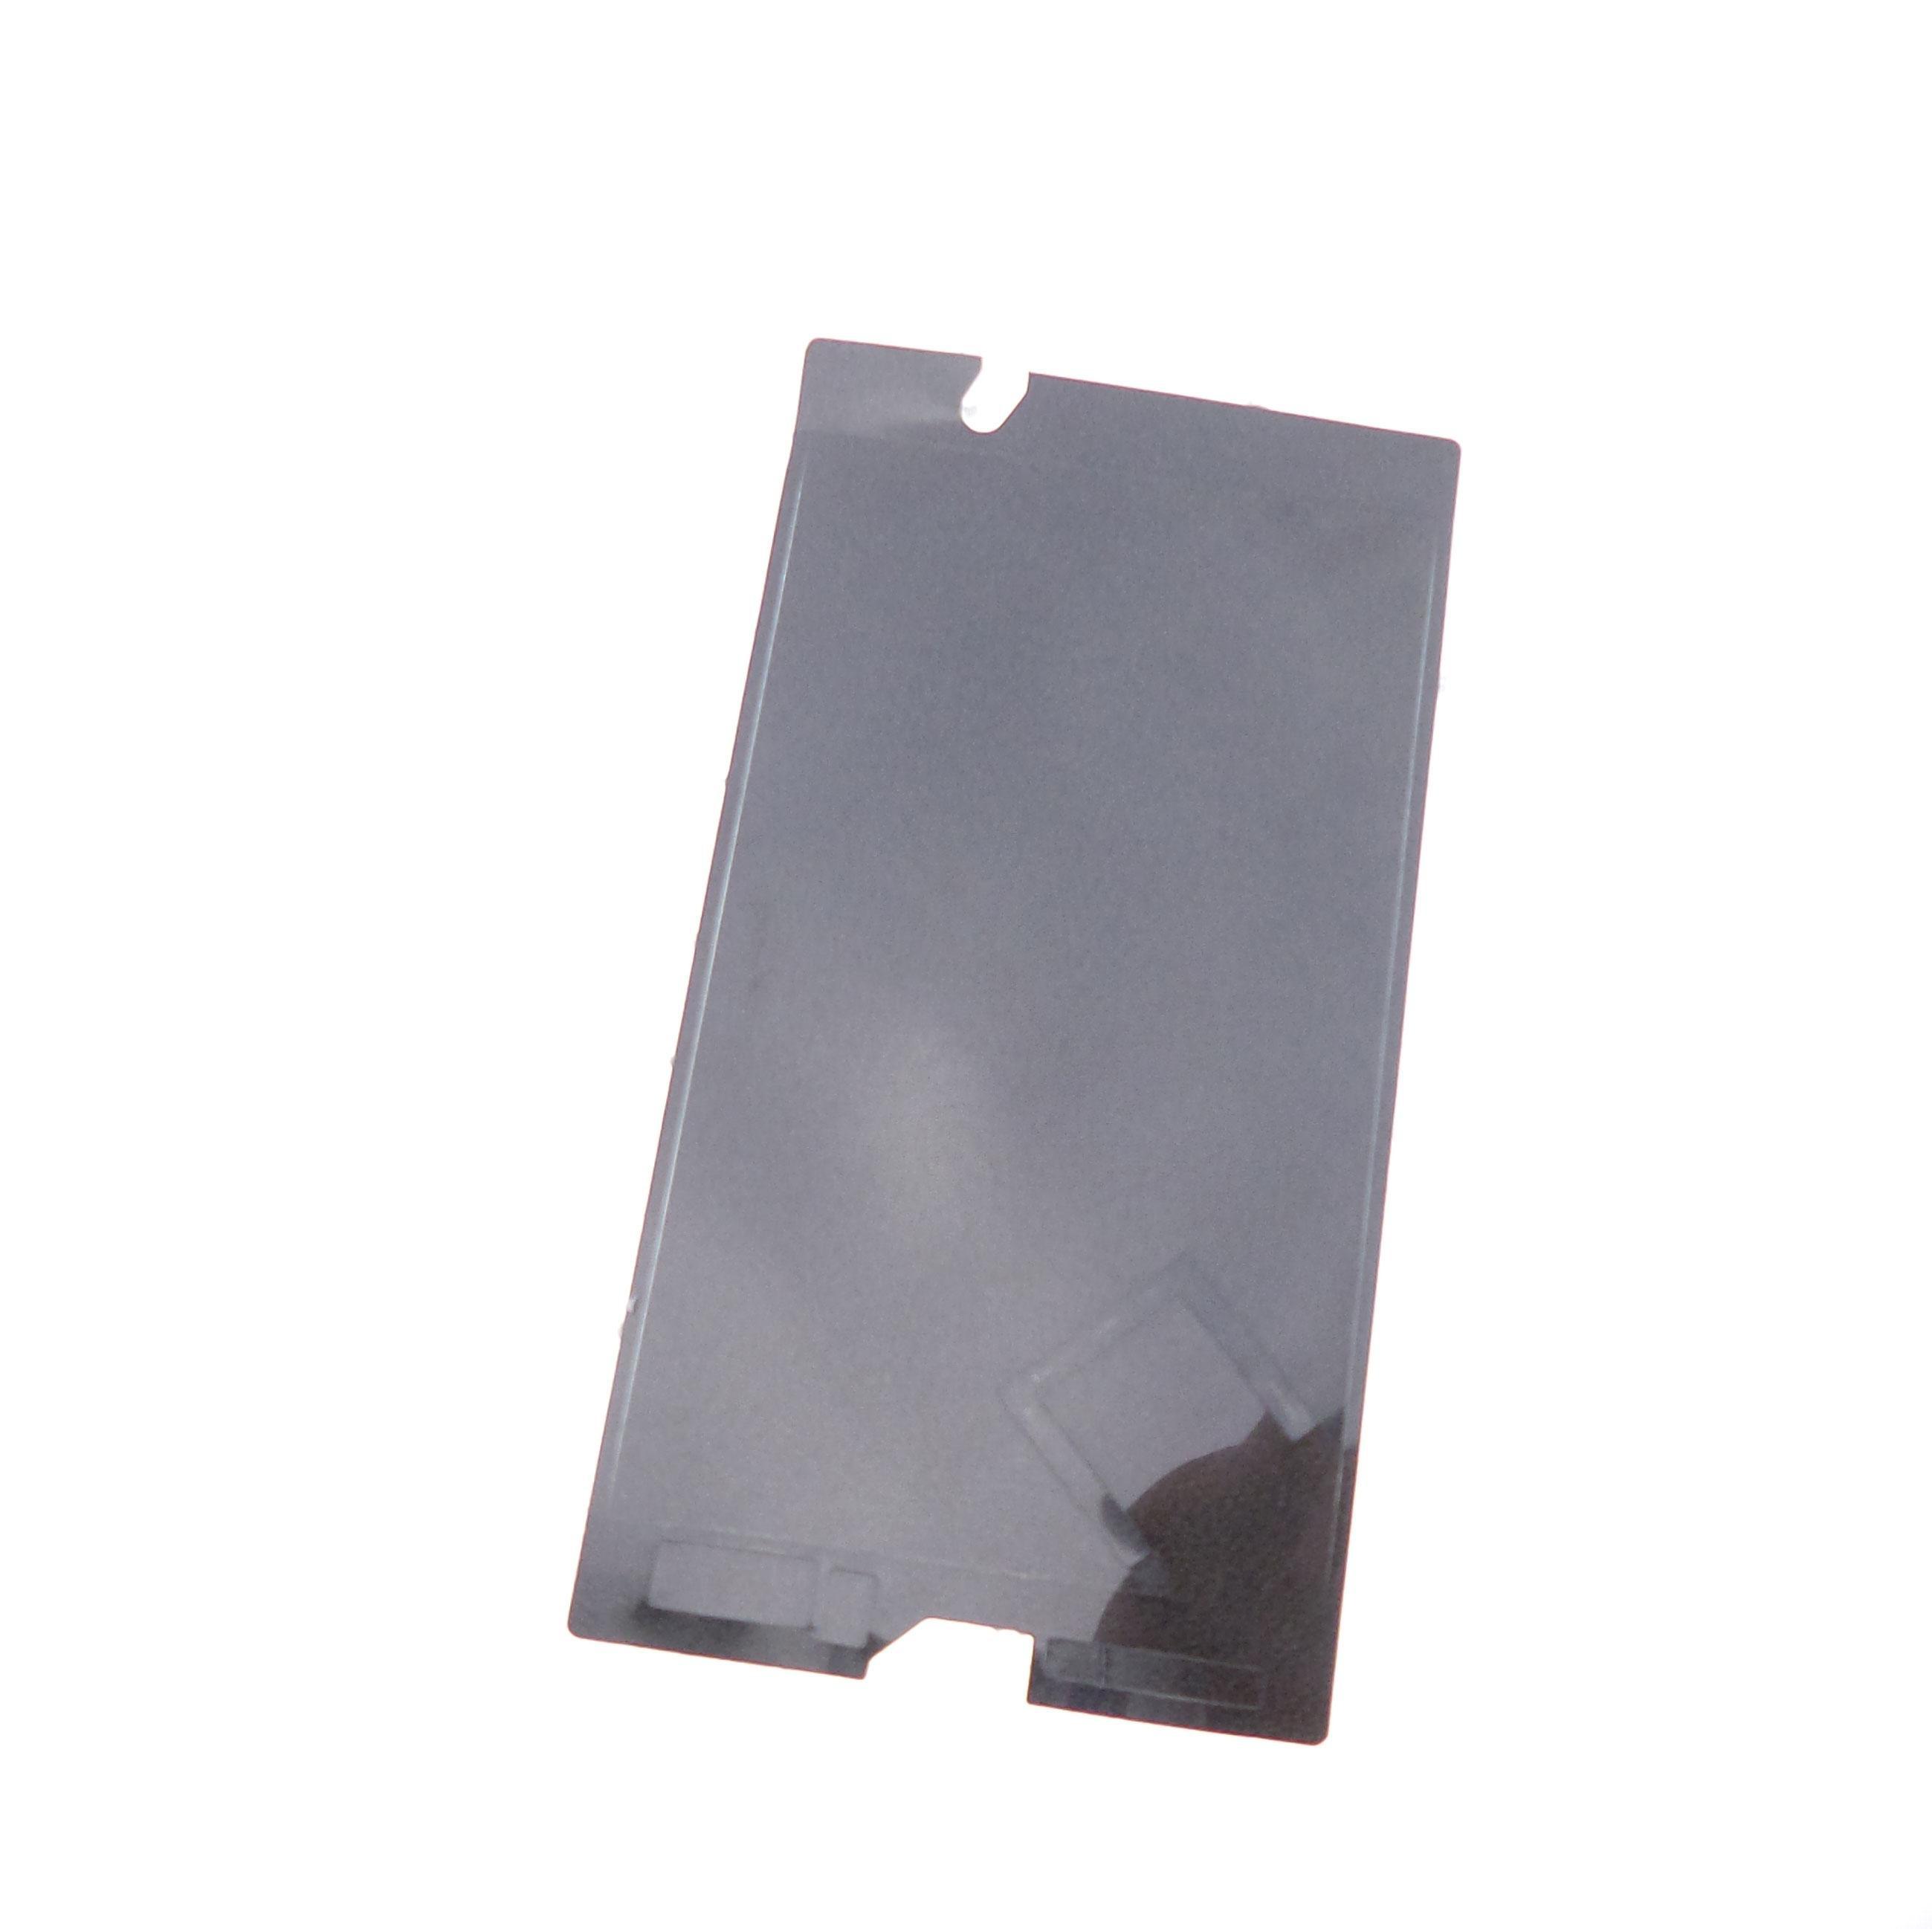 Adhésif prédécoupé tactile-châssis Nokia Lumia 520